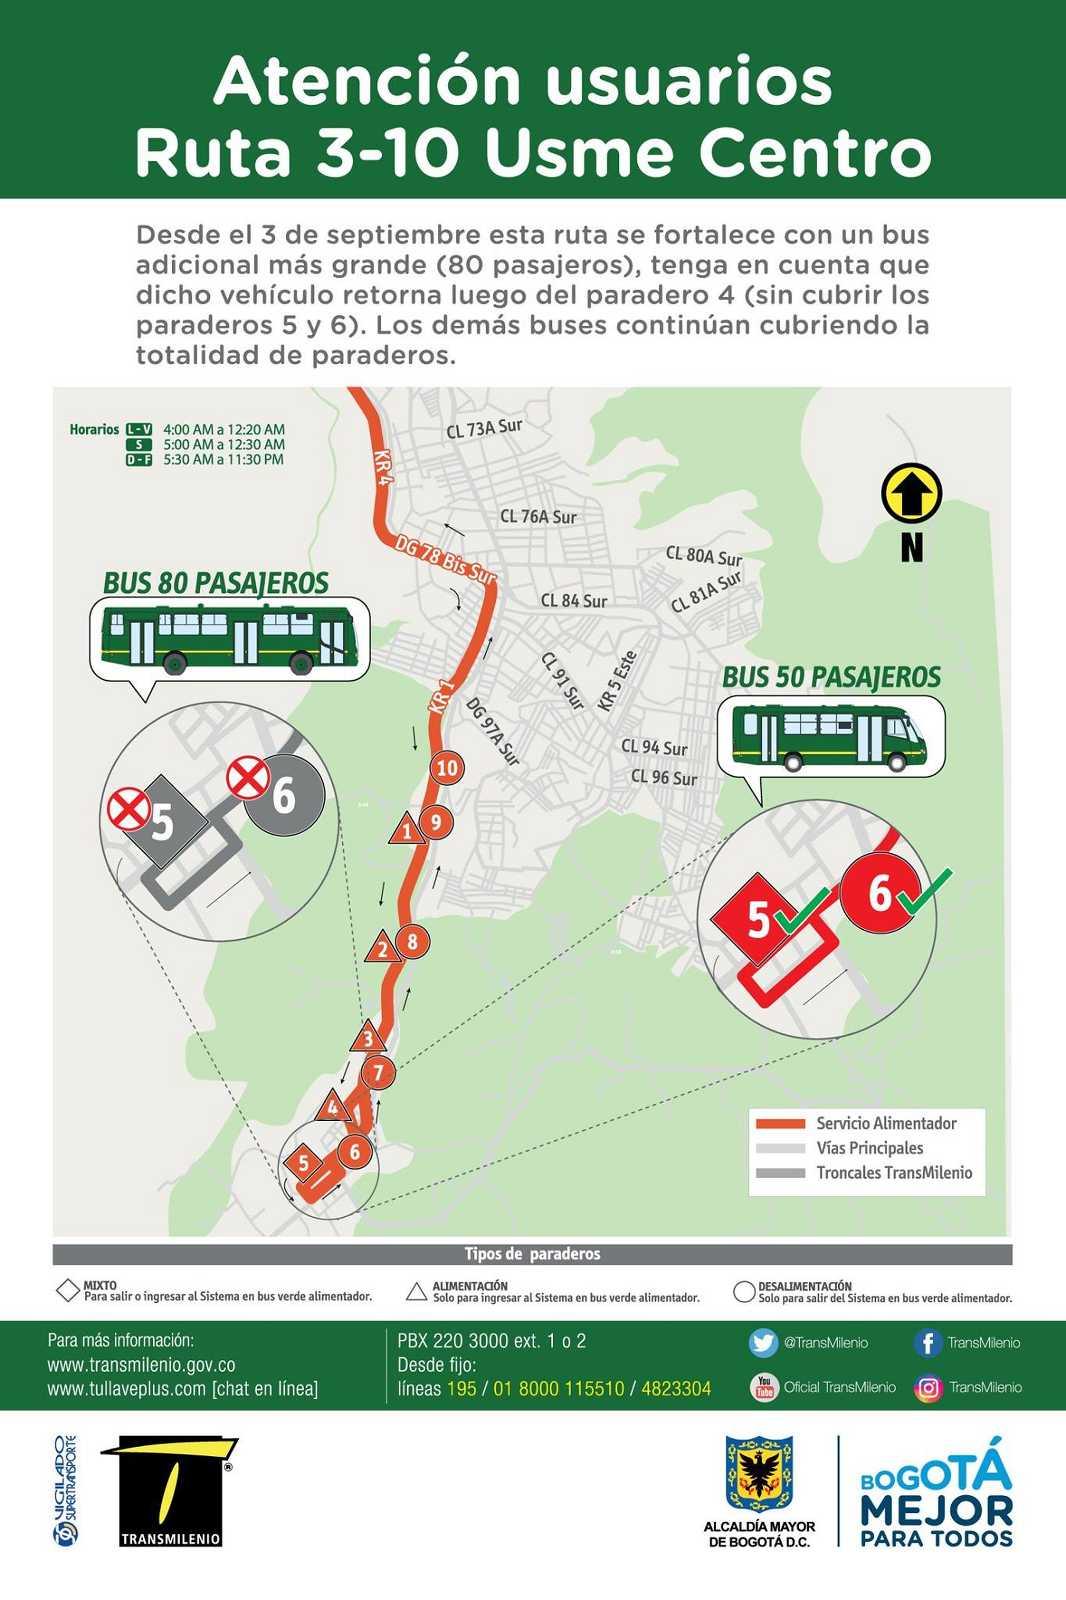 3-10P > Usme Centro (mapa y volante)